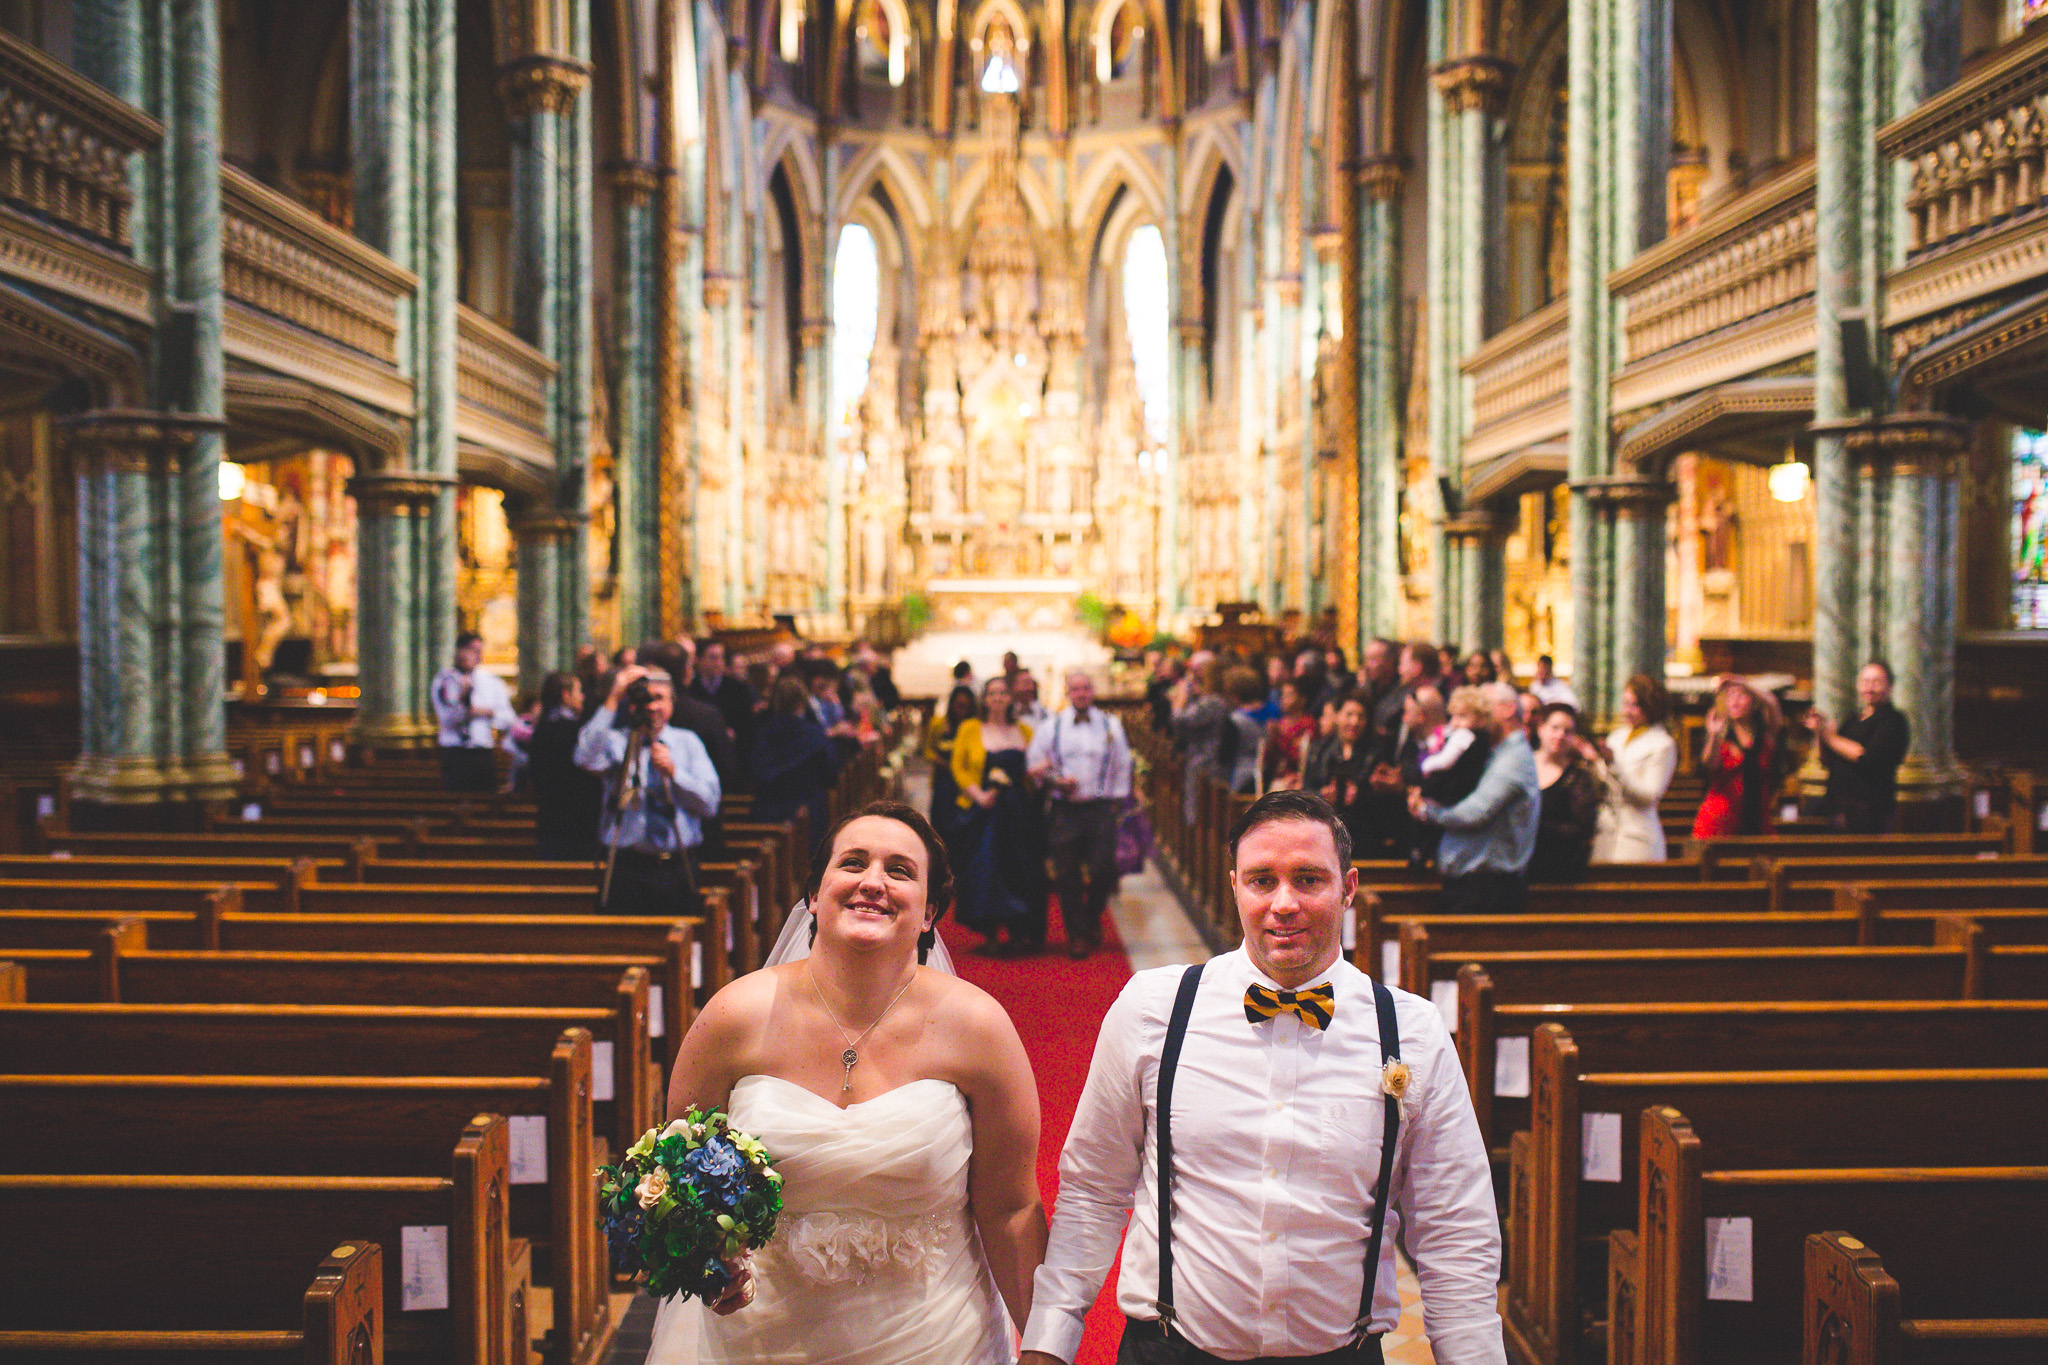 Notre-dame-basilica-wedding-Ottawa